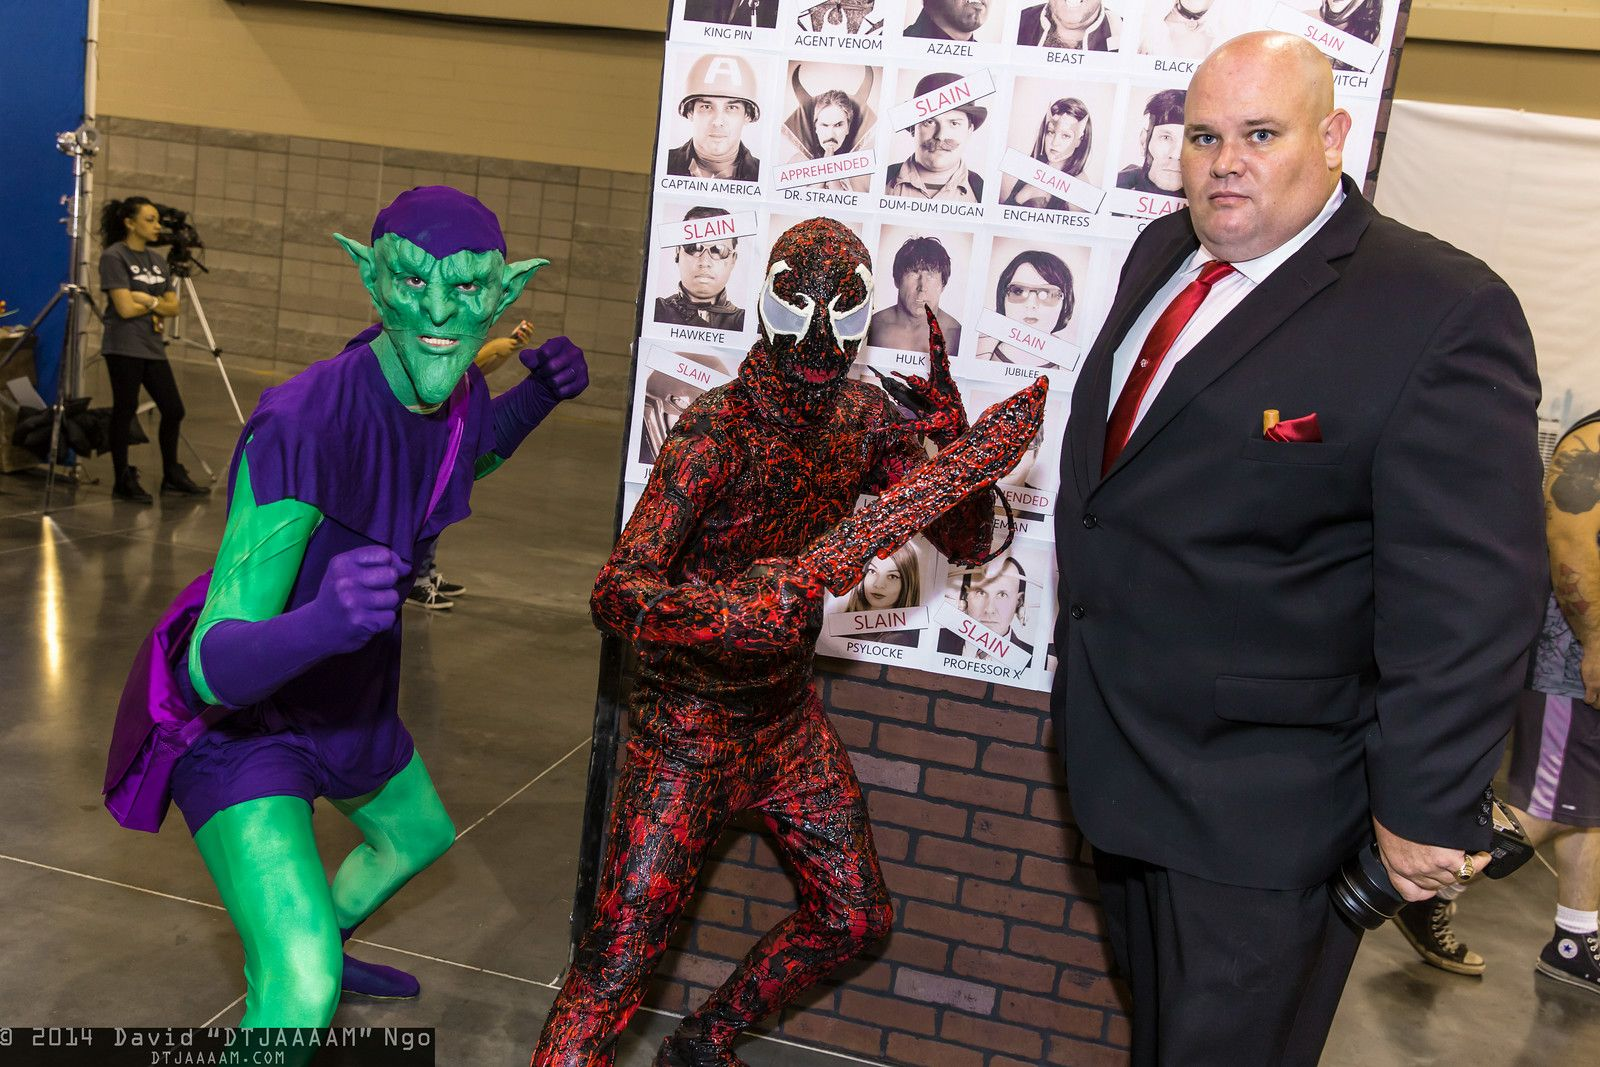 green goblin, carnage, and kingpin #cosplay | phoenix comicon 2014